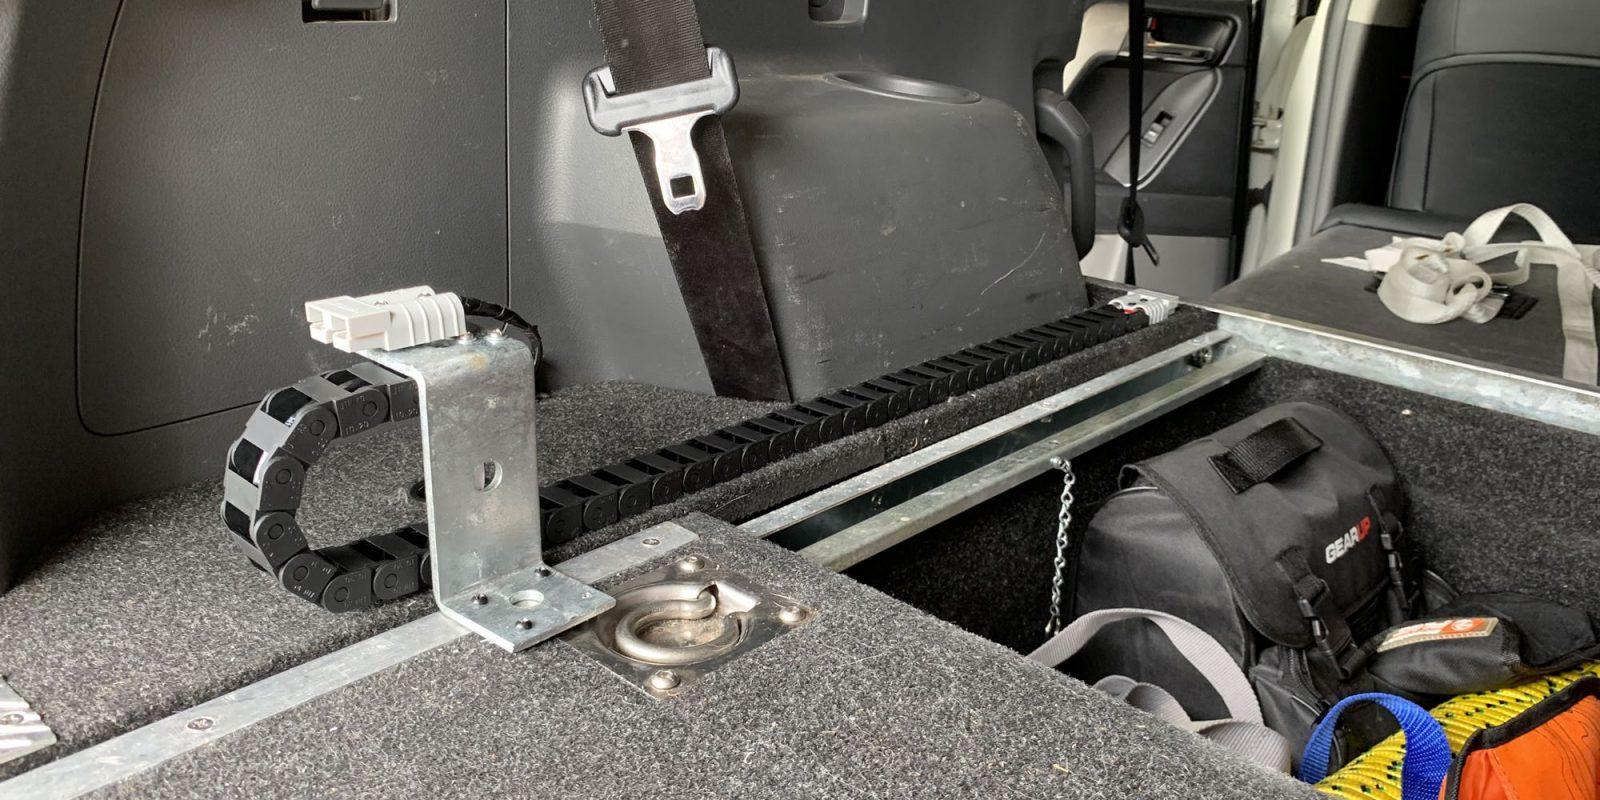 Fridge slide wiring to beat broken cables